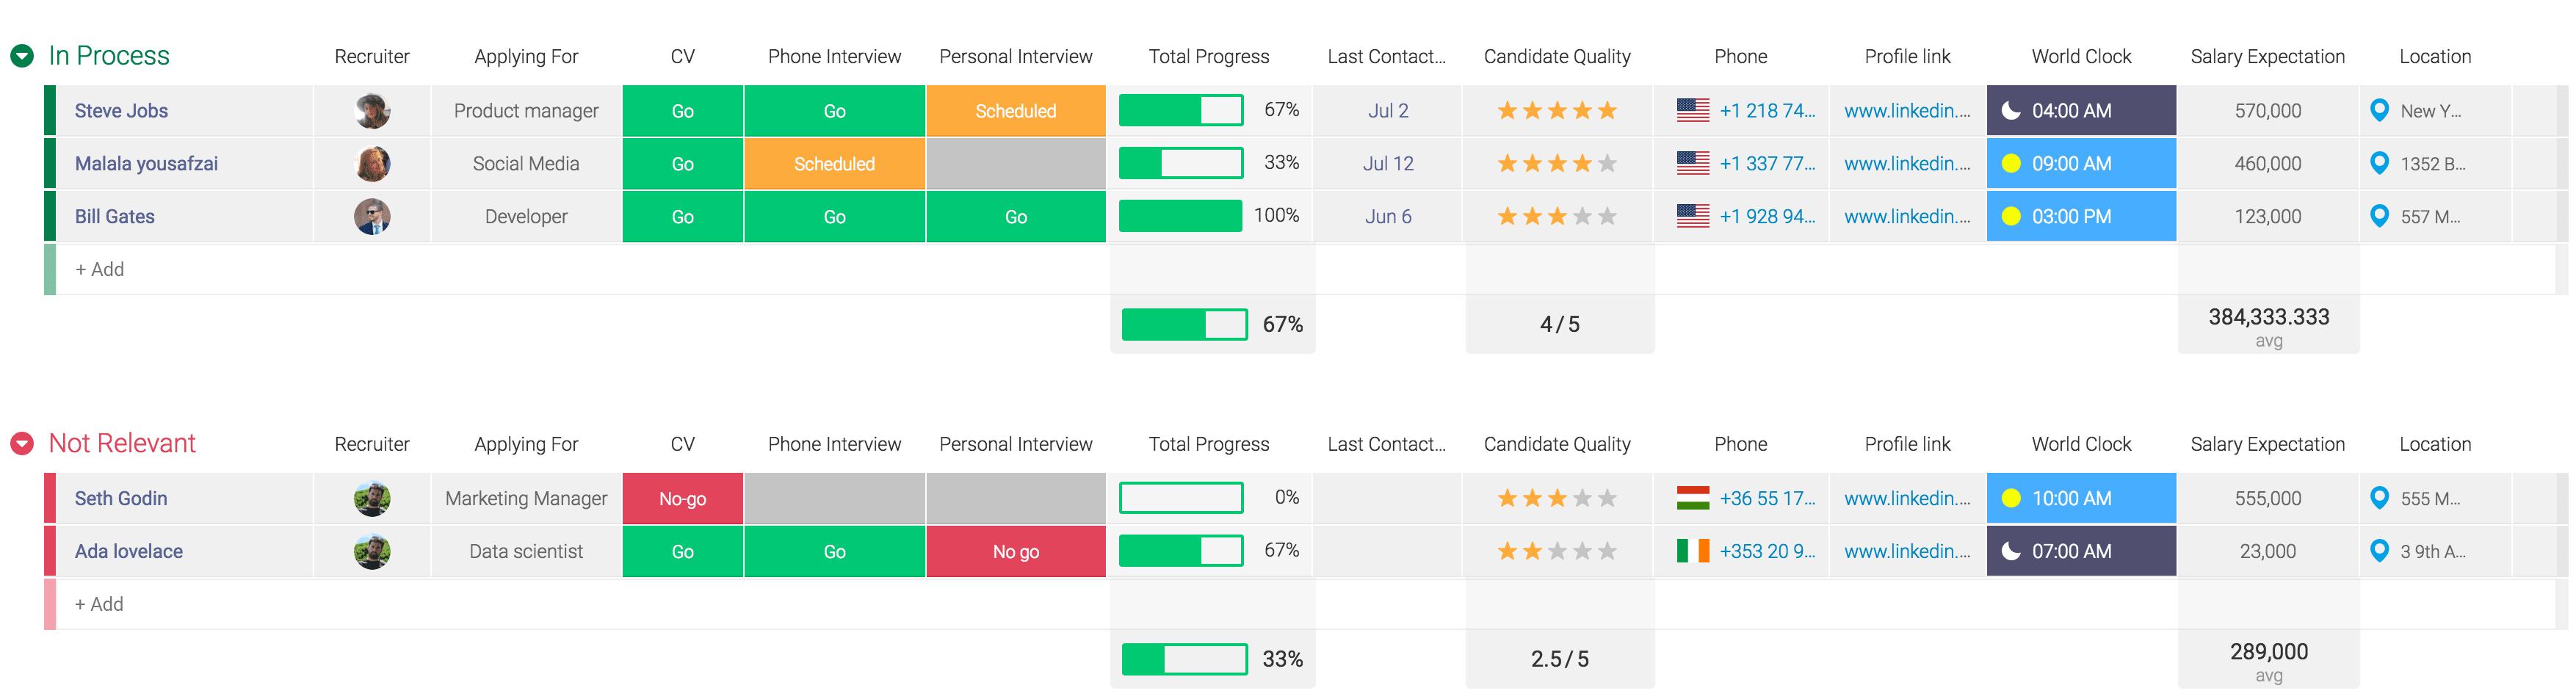 Recruitment Tracker Template